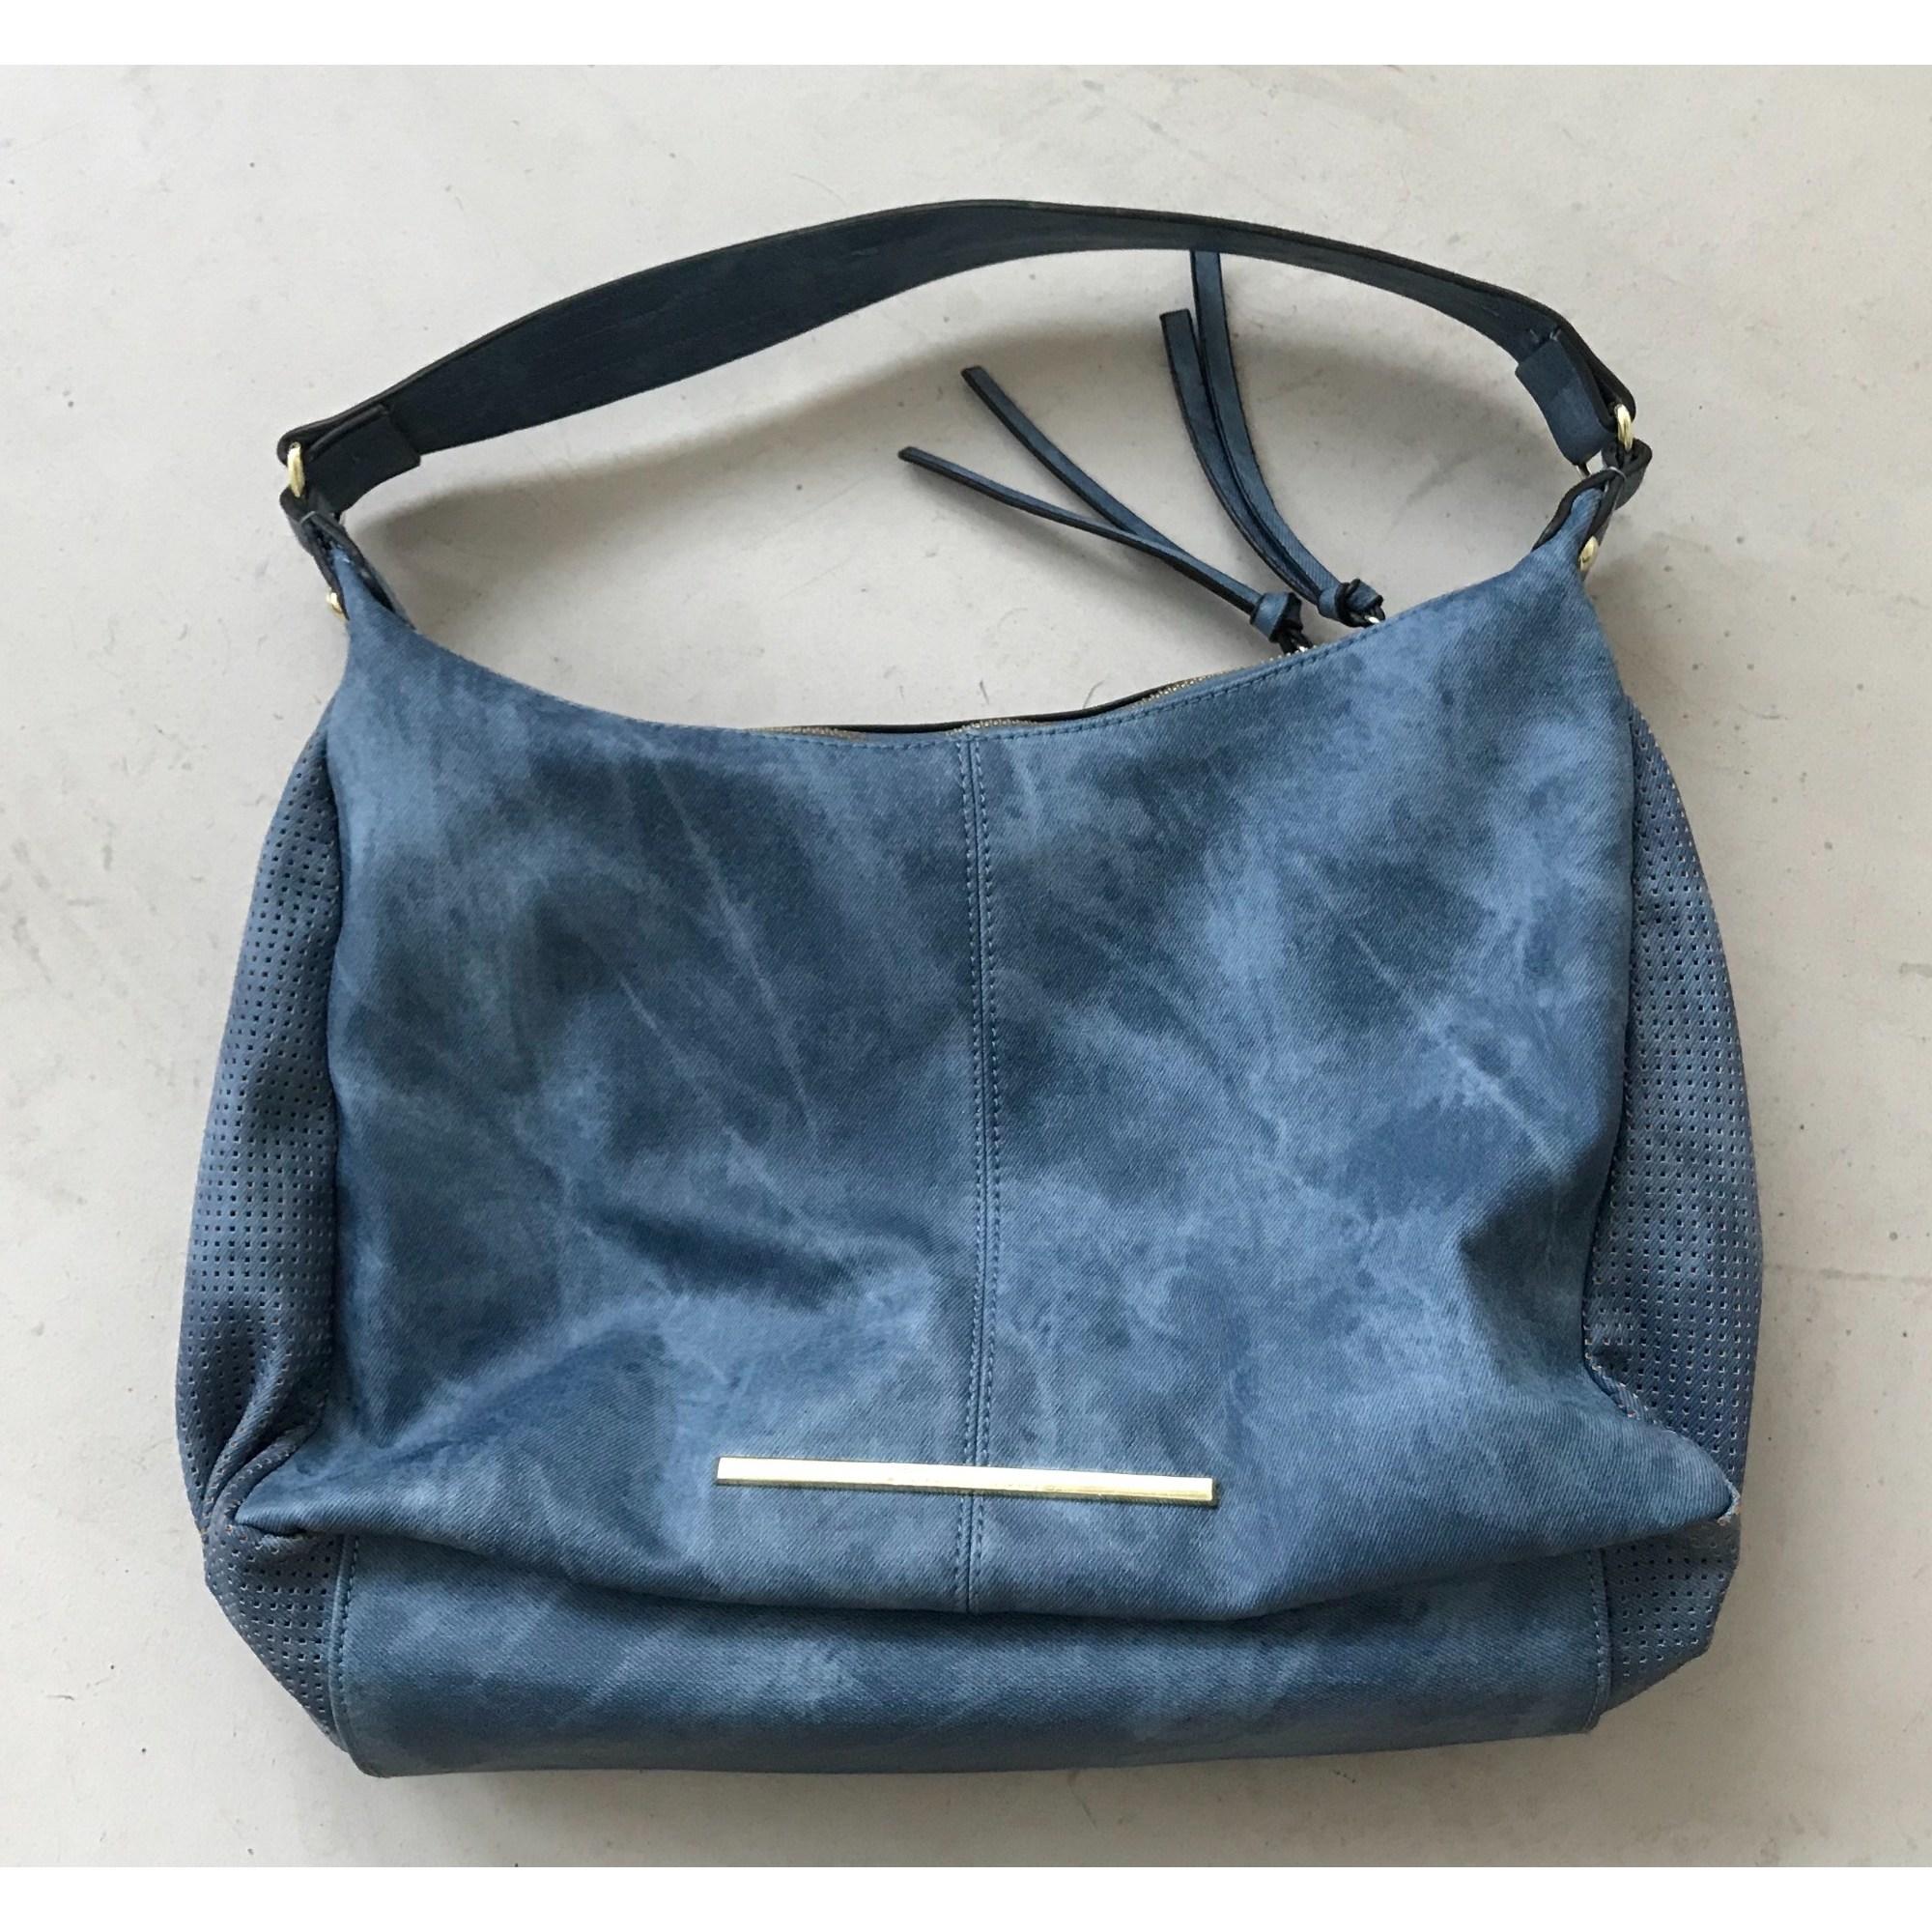 70c035acdb Sac à main en cuir STEVE MADDEN Bleu, bleu marine, bleu turquoise